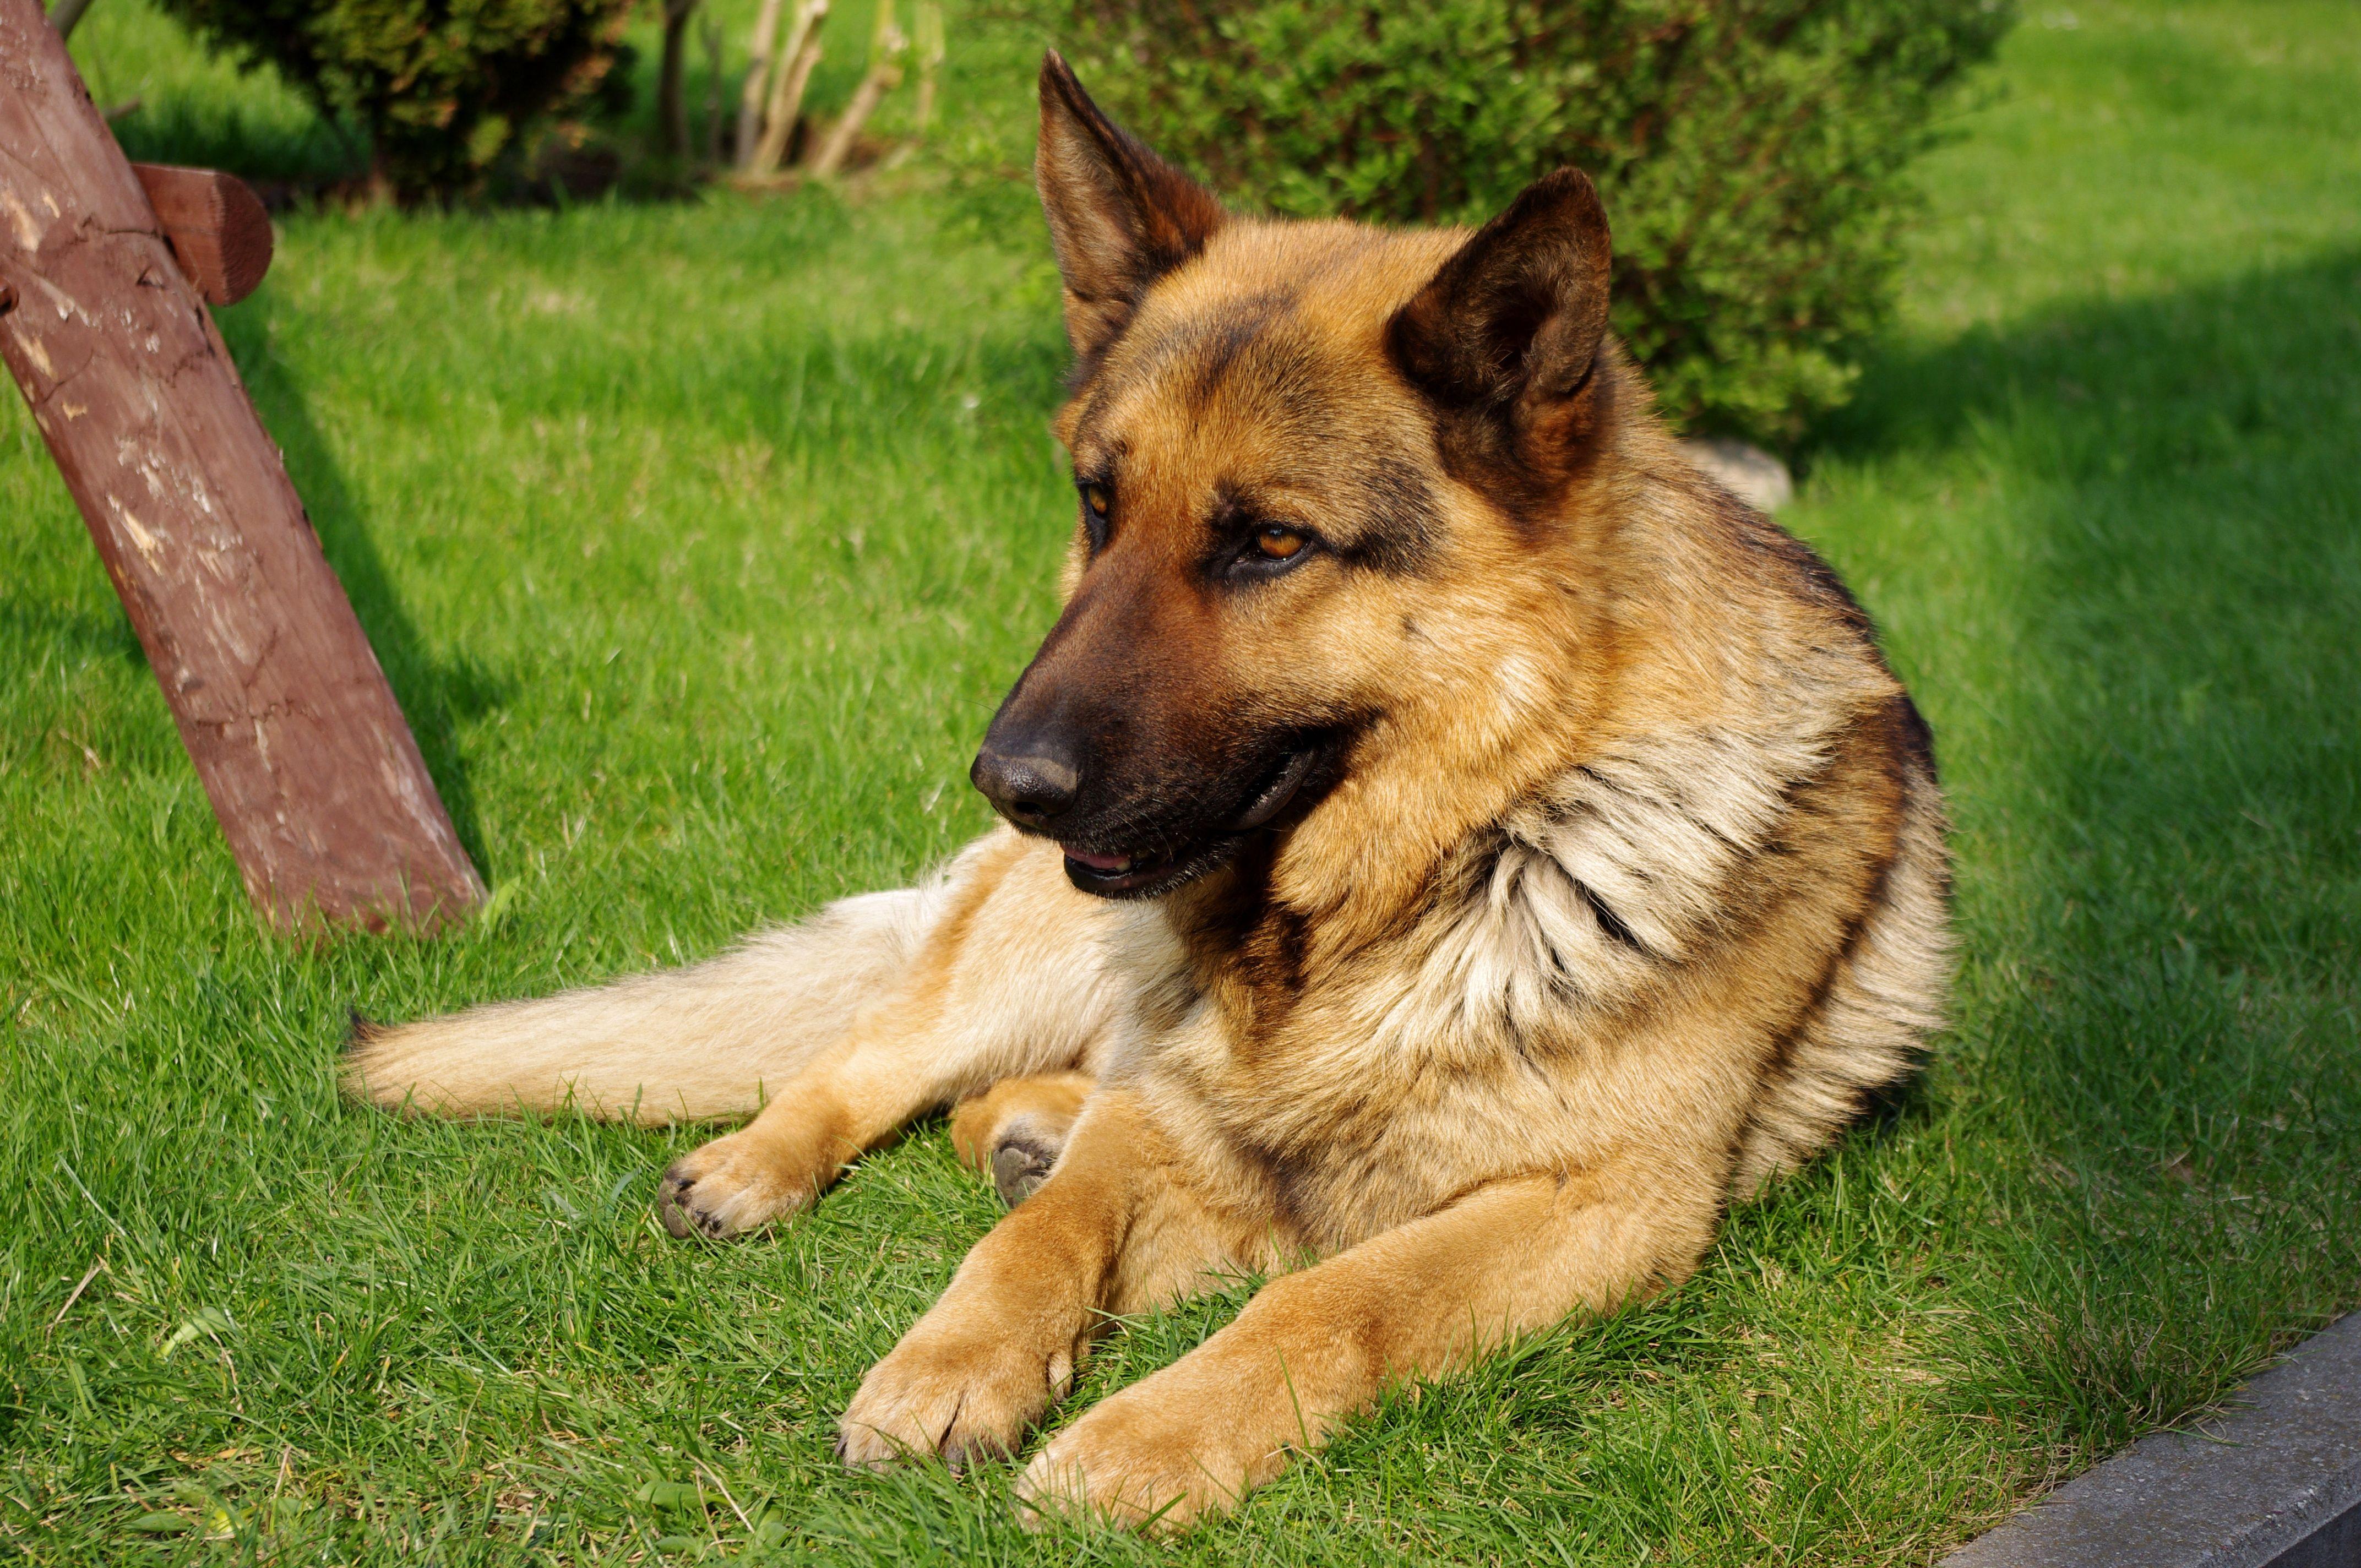 Pin von chumani_on_tree auf Shepherds & Wolfdogs